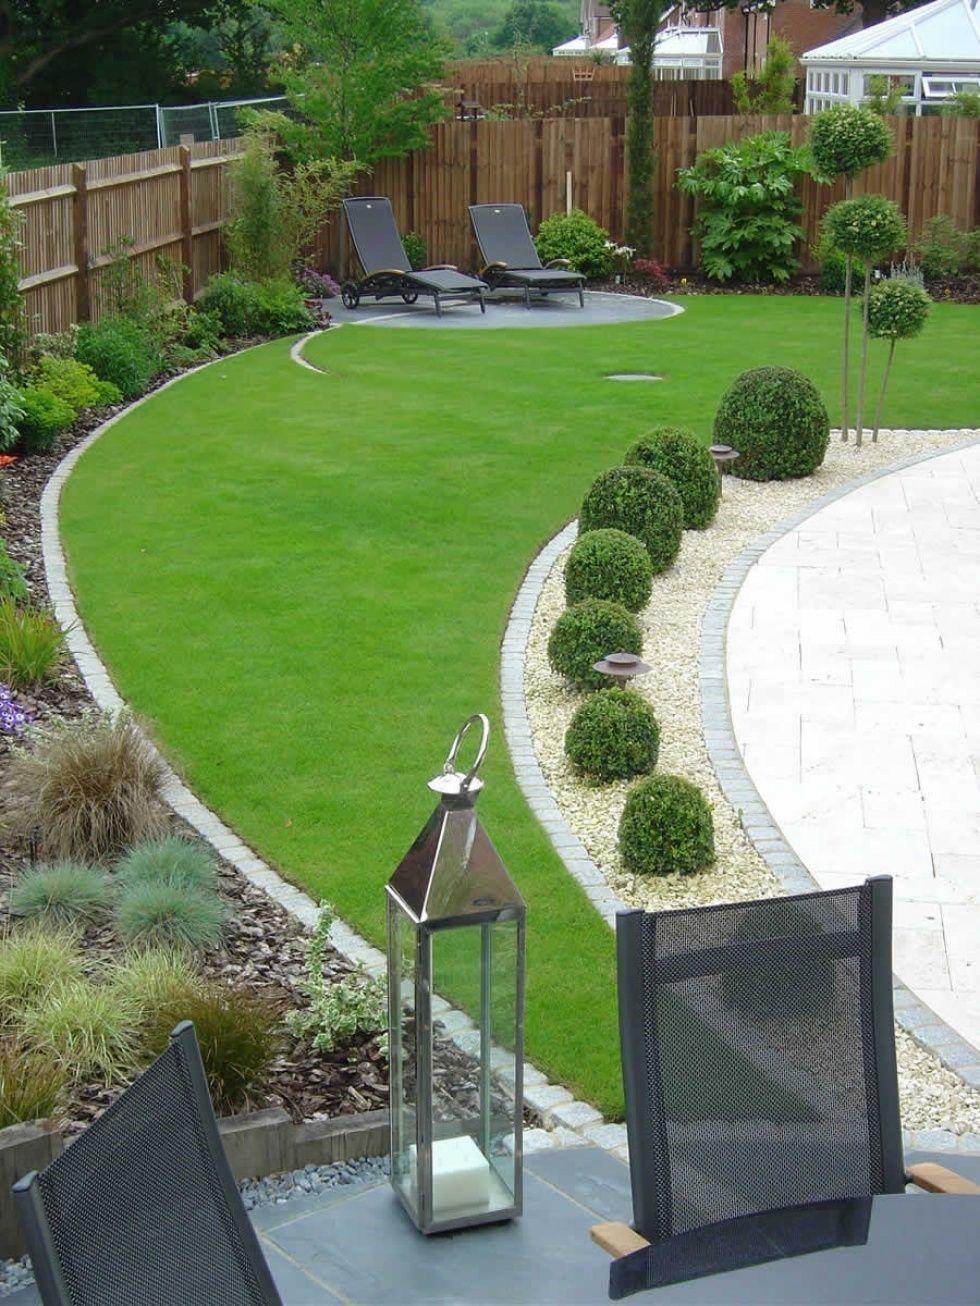 16 Ikea Hacks That Will Maximize Storage And Organization In Any Entryway Backyard Garden Landscape Garden Design Backyard Garden Design